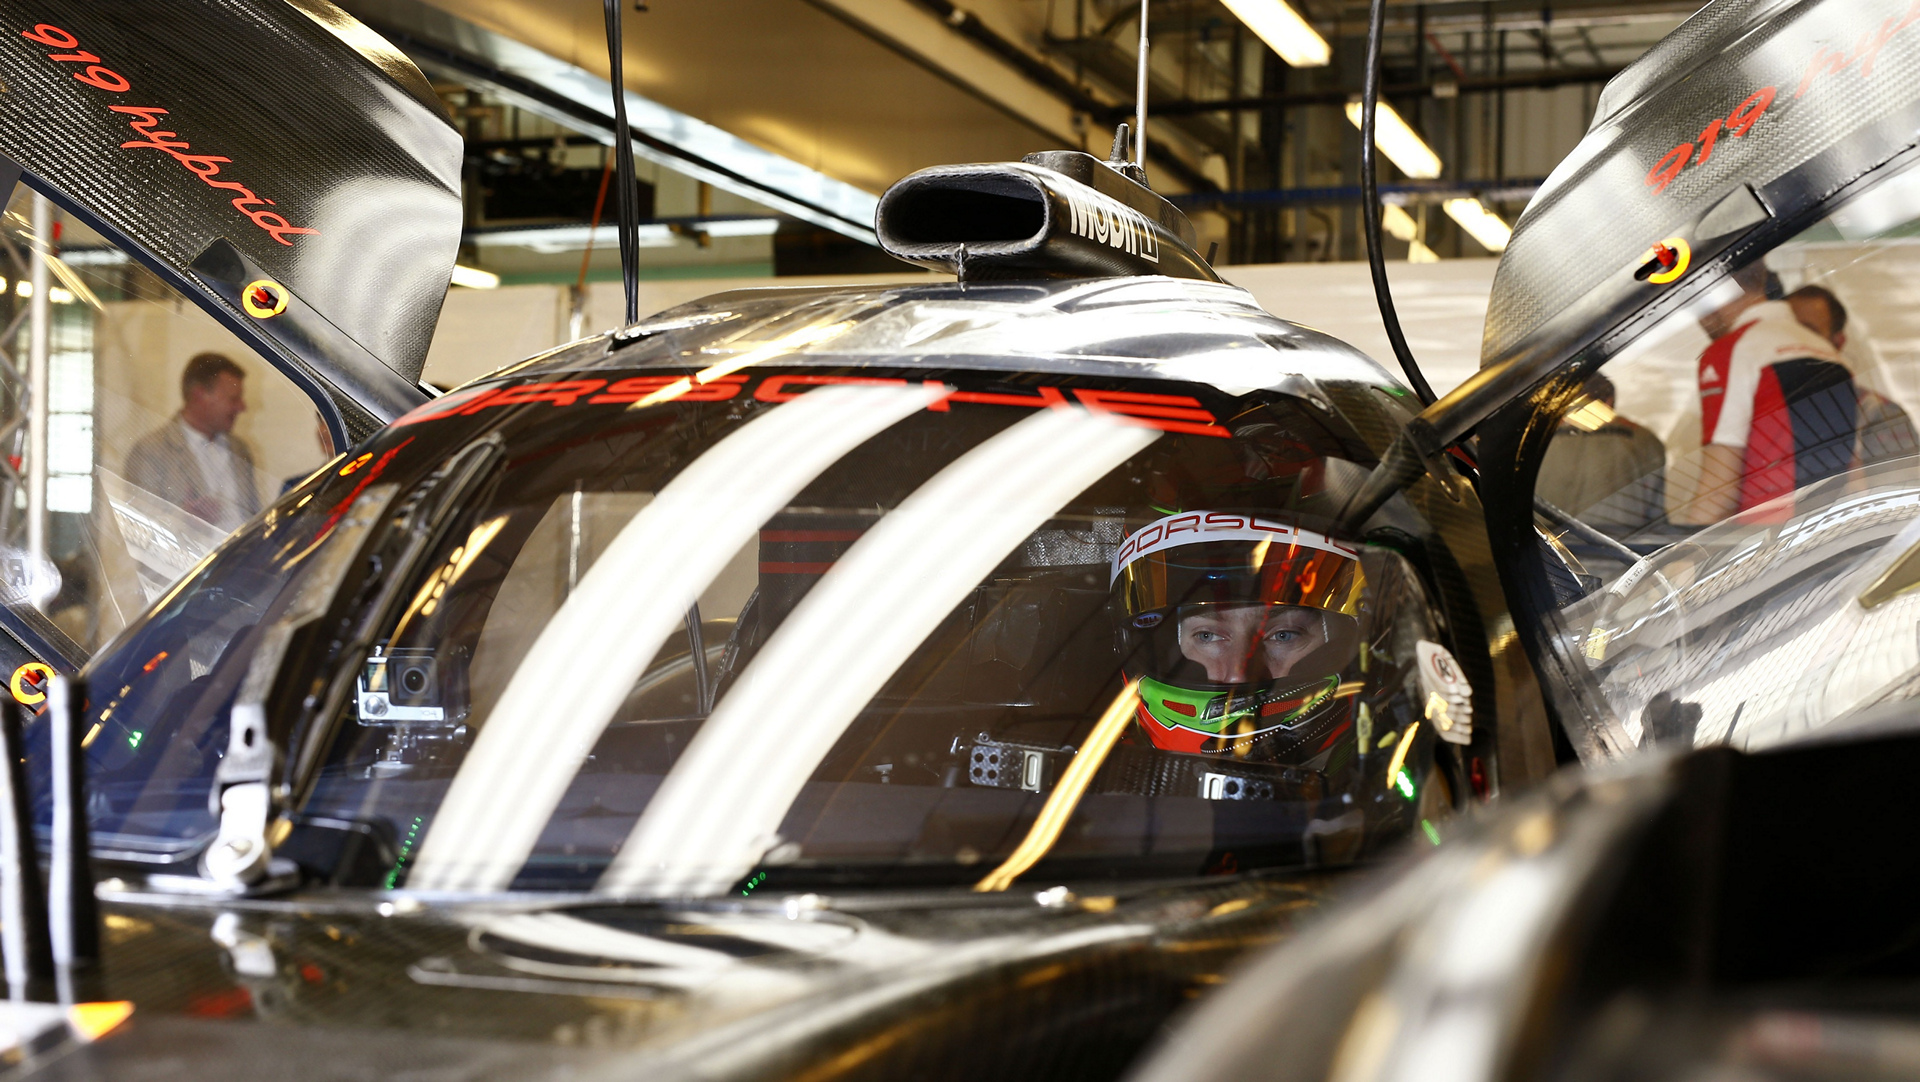 Porsche 919 Hybrid, Brendon Hartley, Test Abu Dhabi © Dr. Ing. h.c. F. Porsche AG